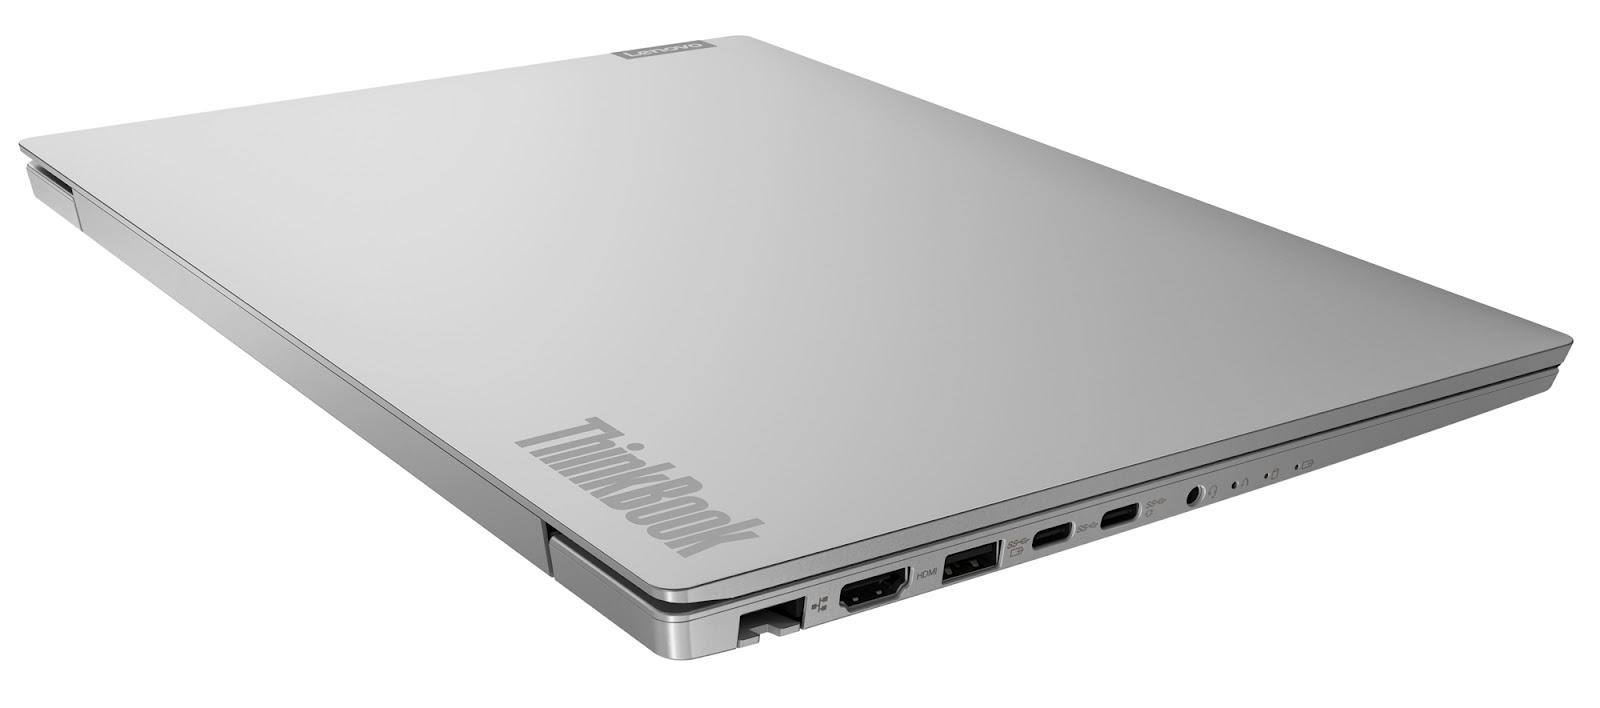 Фото 3. Ноутбук Lenovo ThinkBook 14 IIL (20SL00FARU)